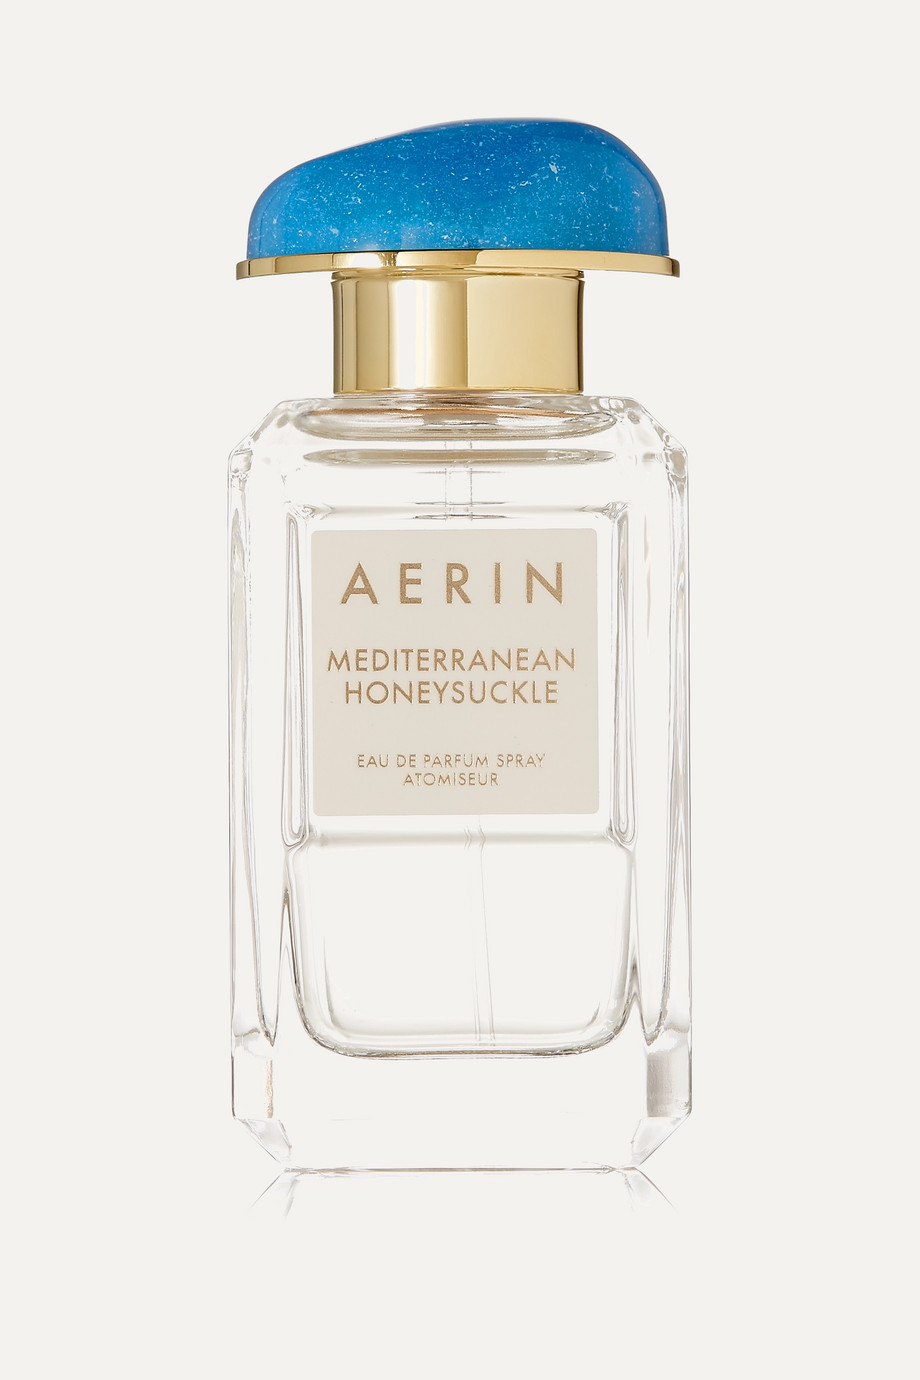 AERIN Beauty Mediterranean Honeysuckle, 50 ml – Eau de Parfum